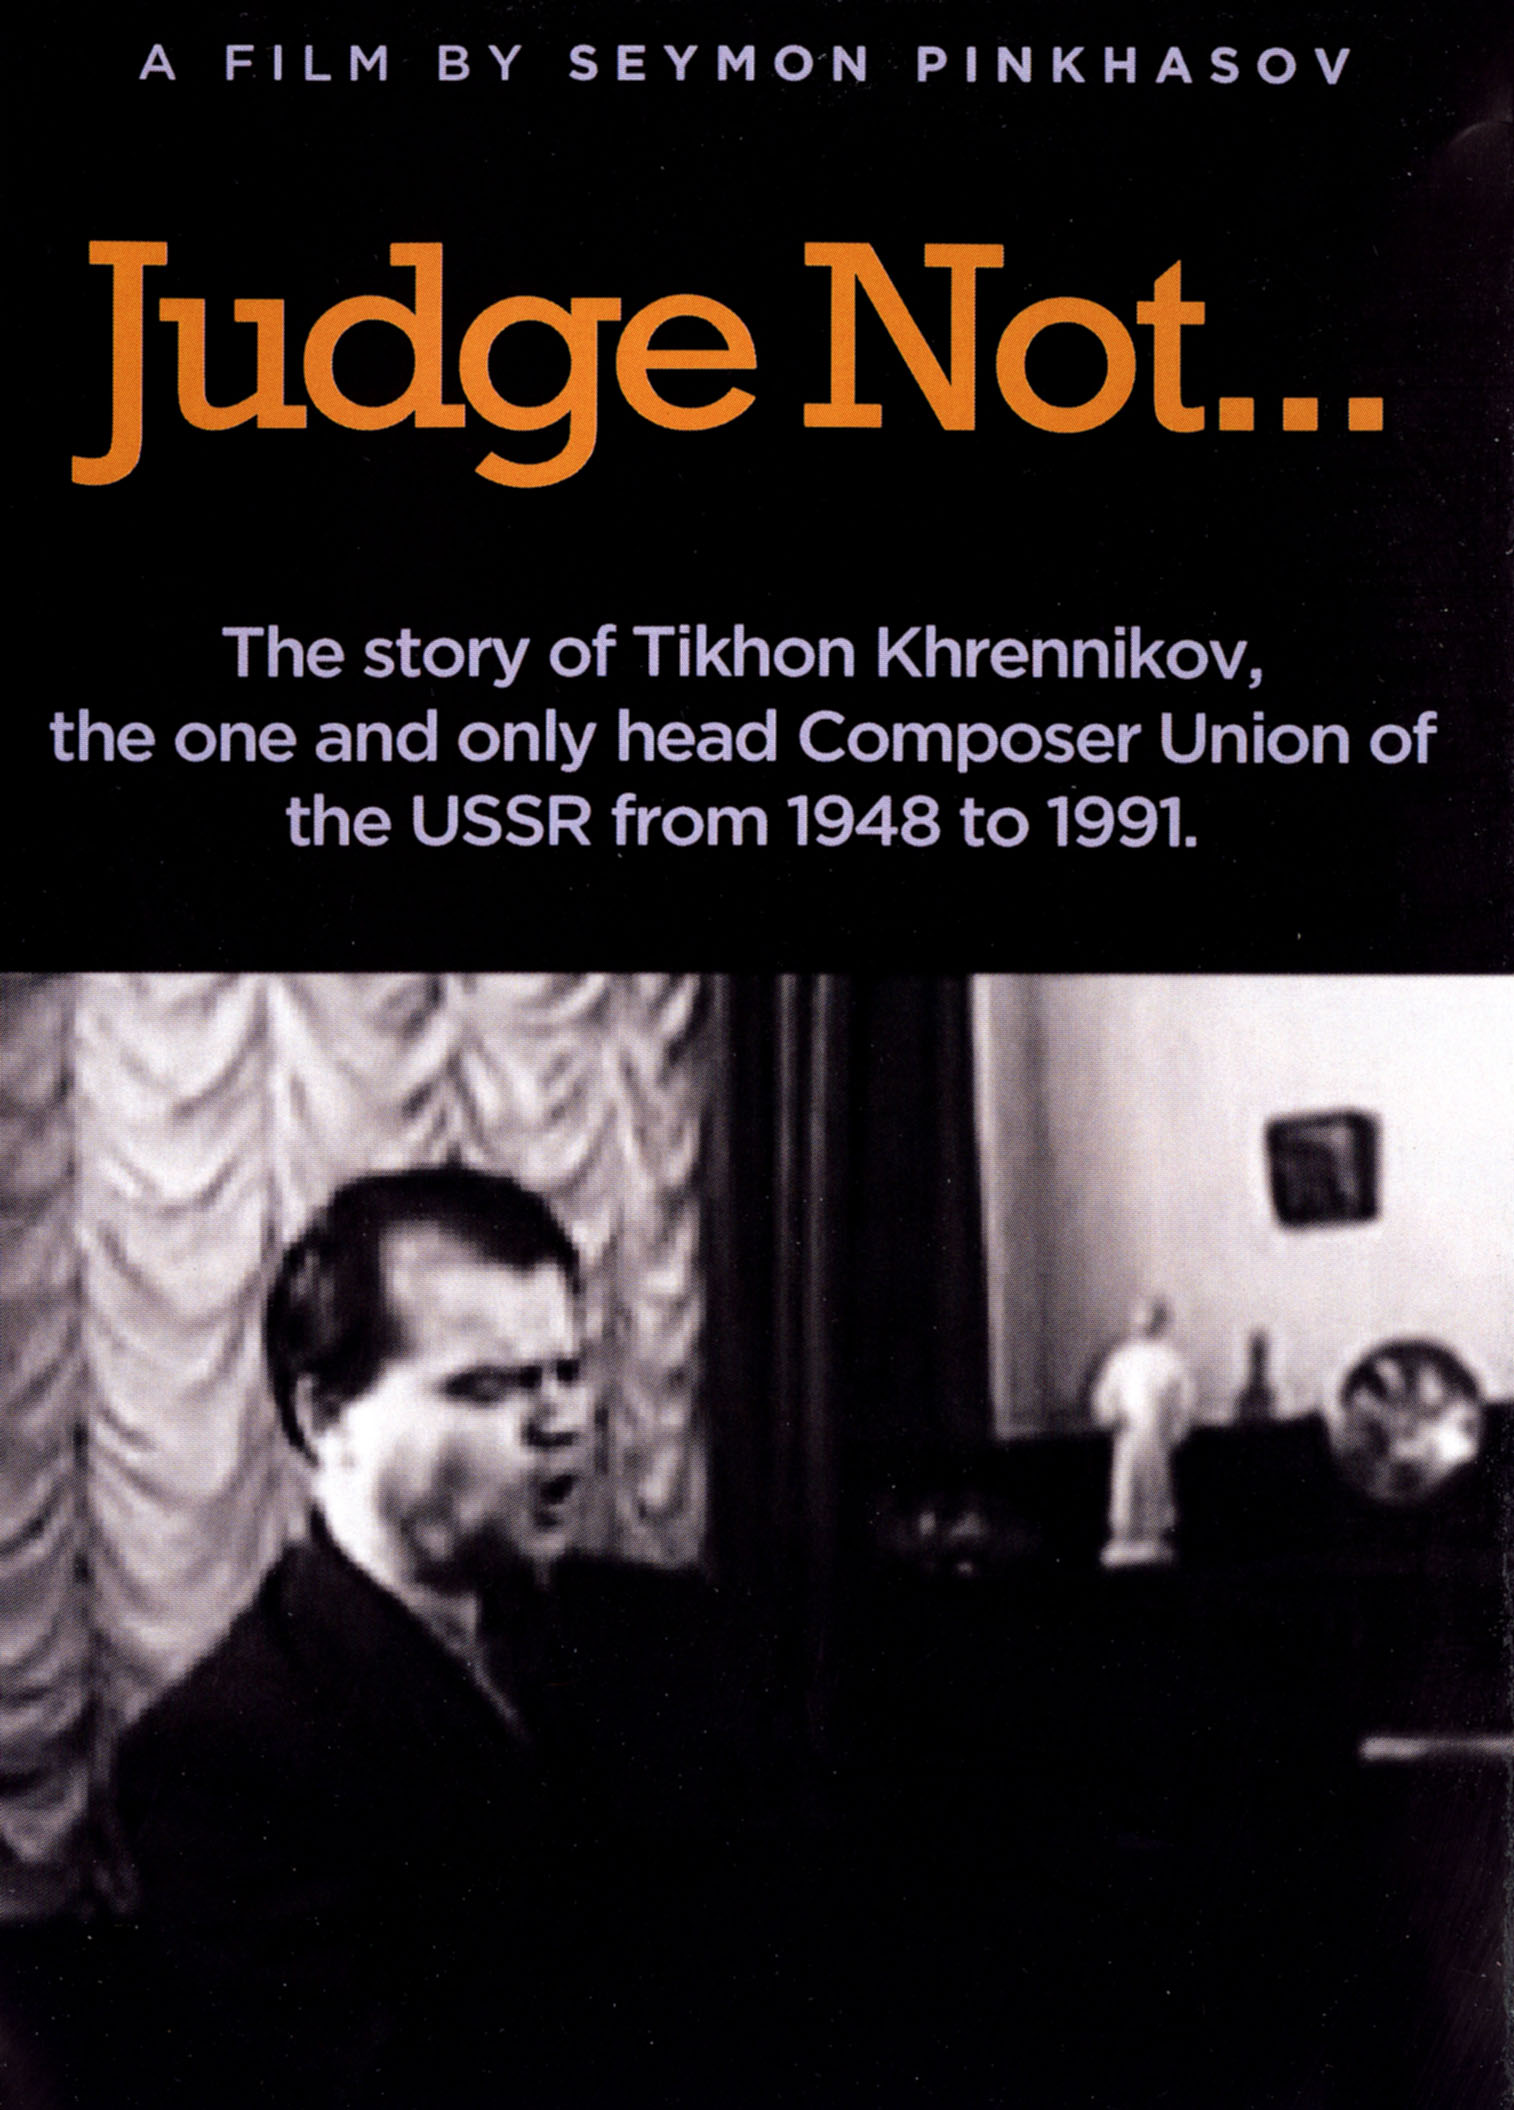 Judge Not...